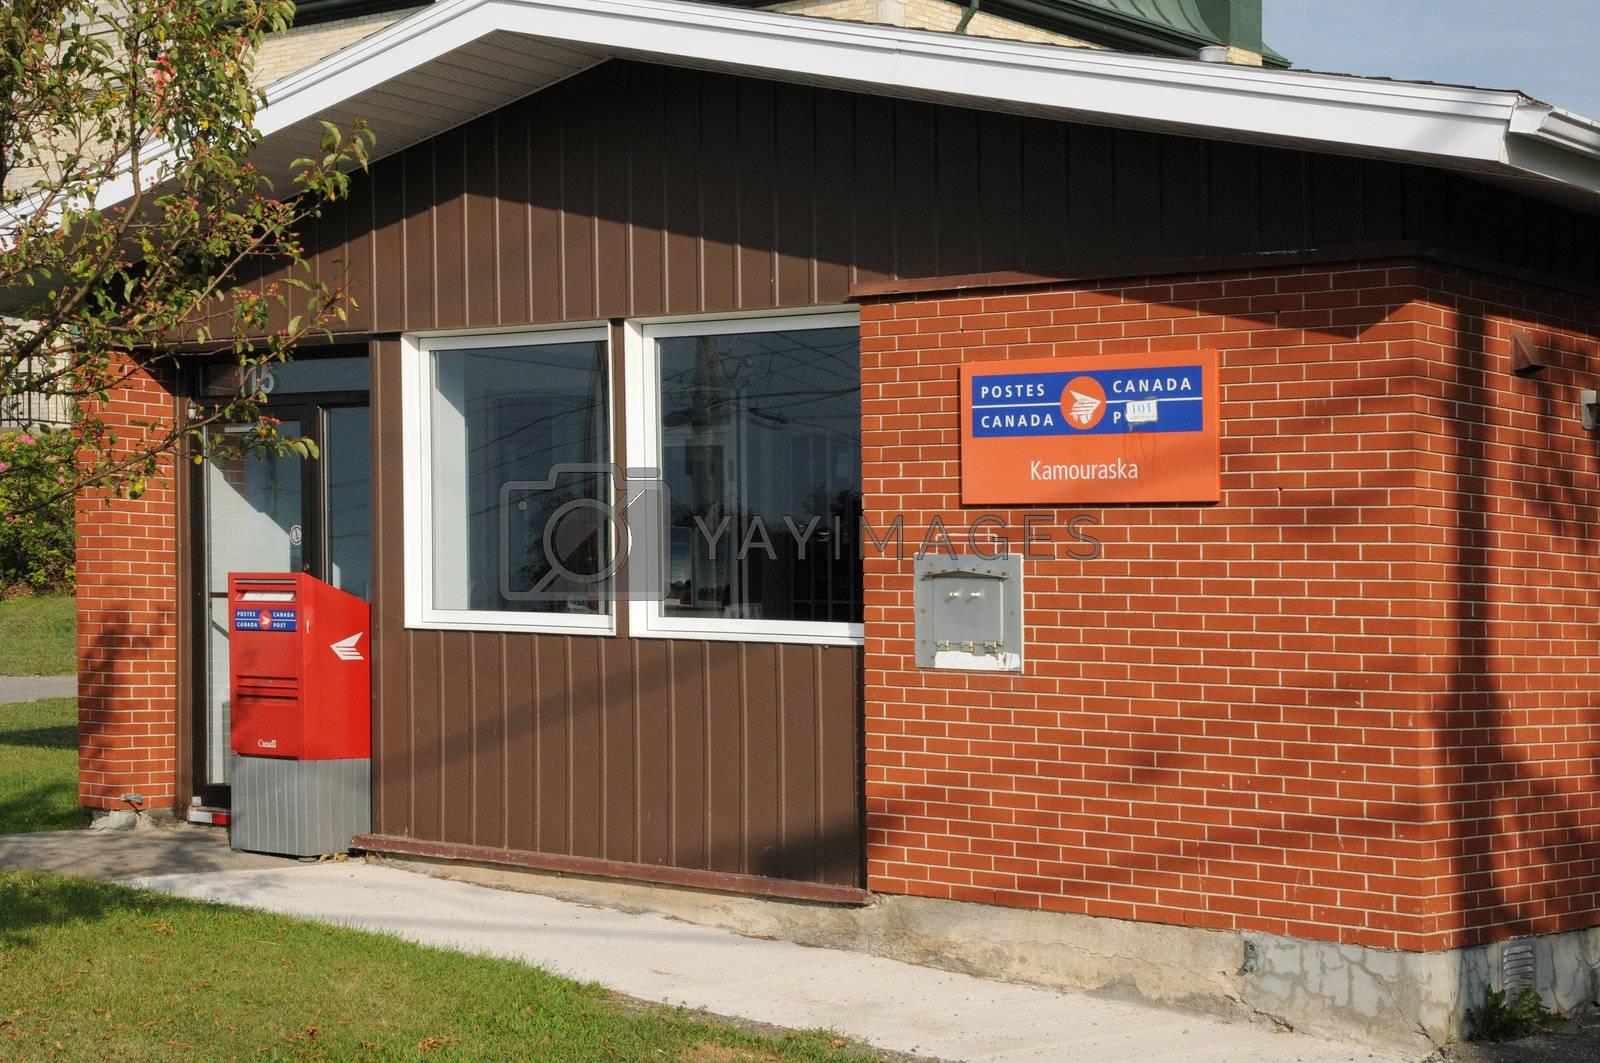 Canada, Quebec, the post office of Kamouraska